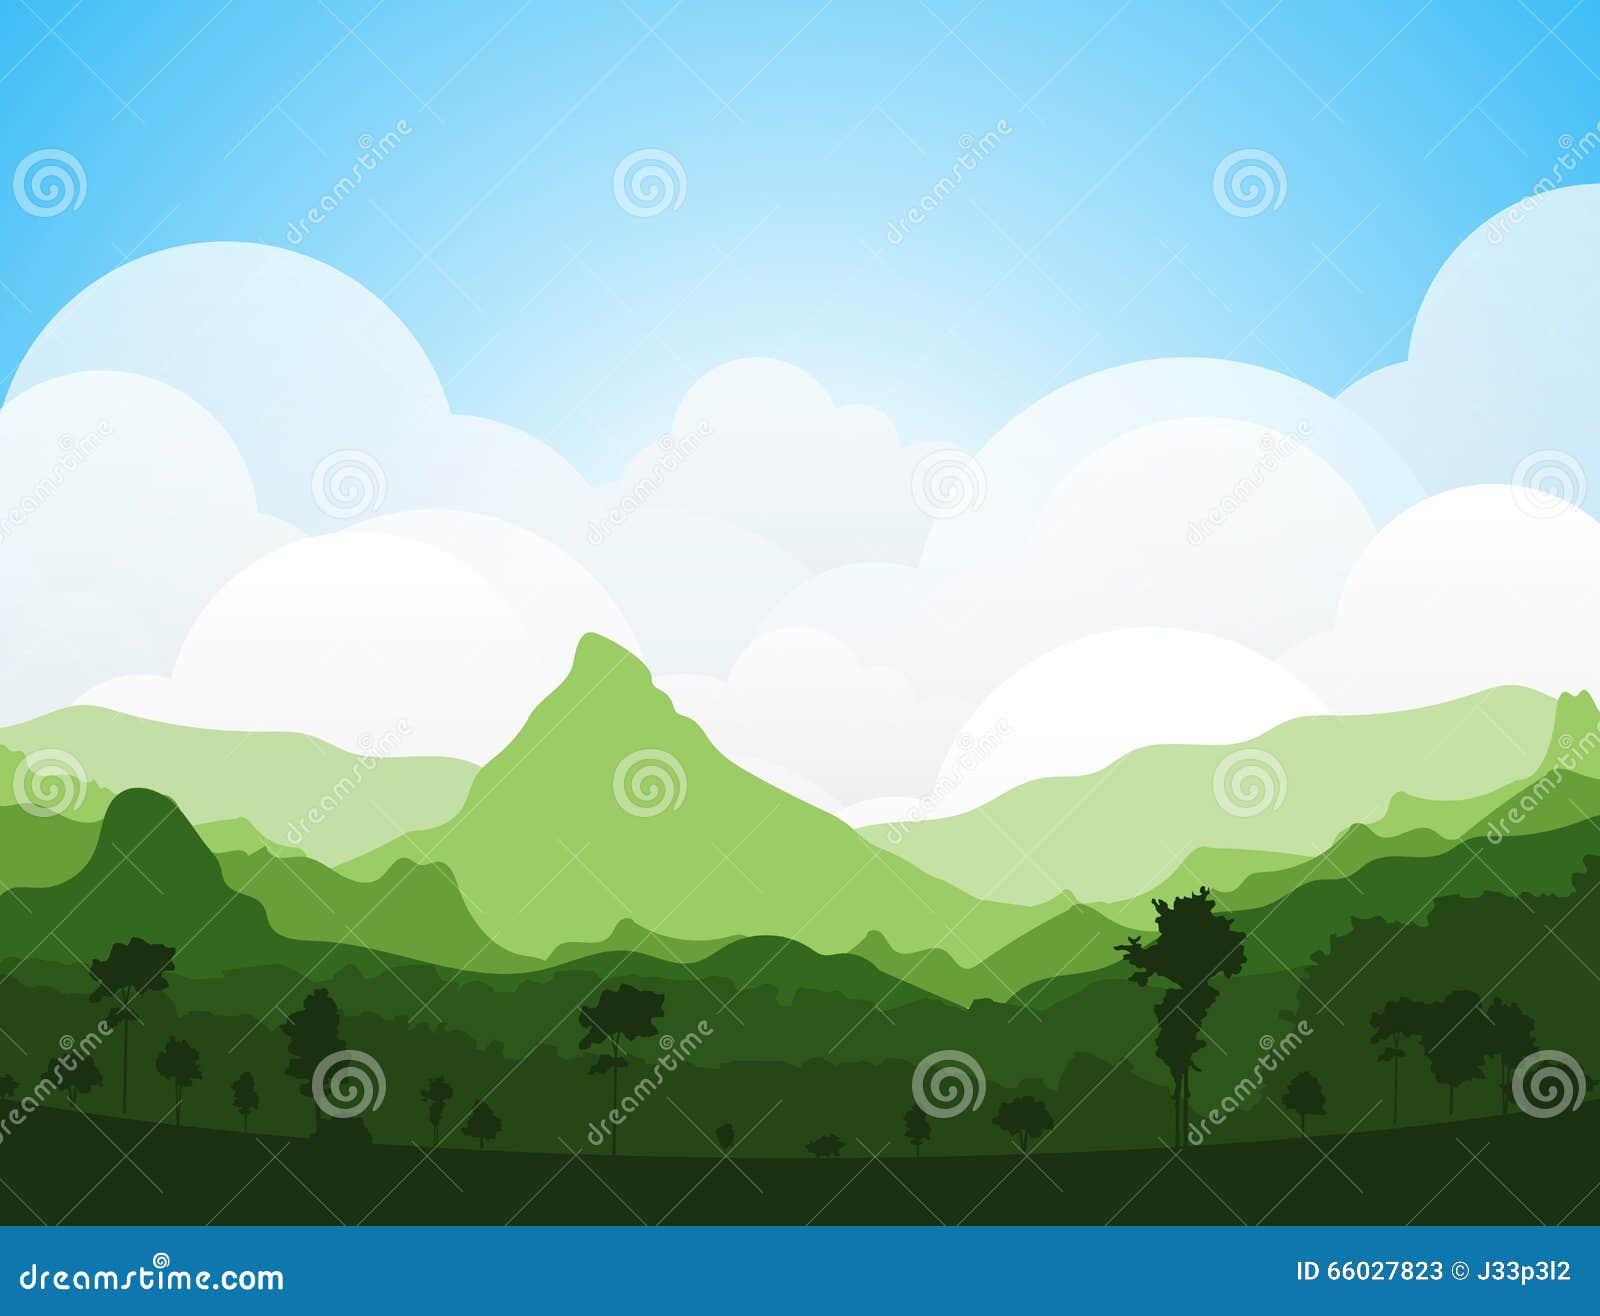 Landscape Illustration Vector Free: Colorful Silhouette Summer Landscape Stock Vector